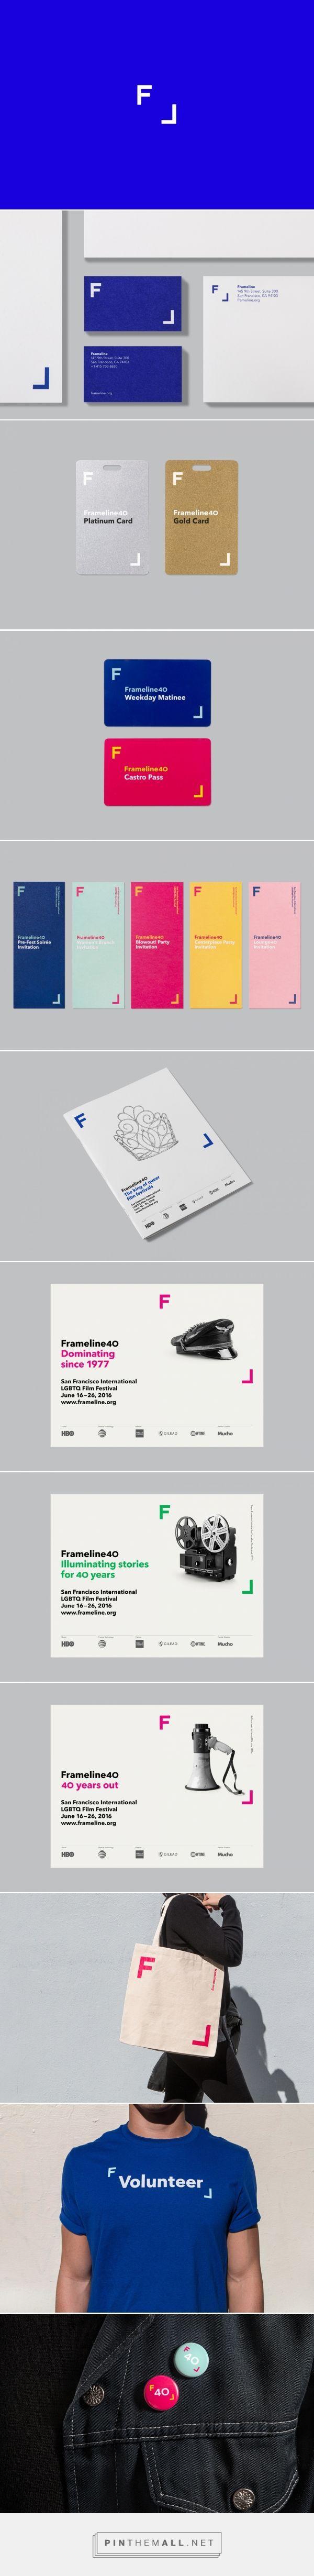 Frameline Brand Mockups by Mucho